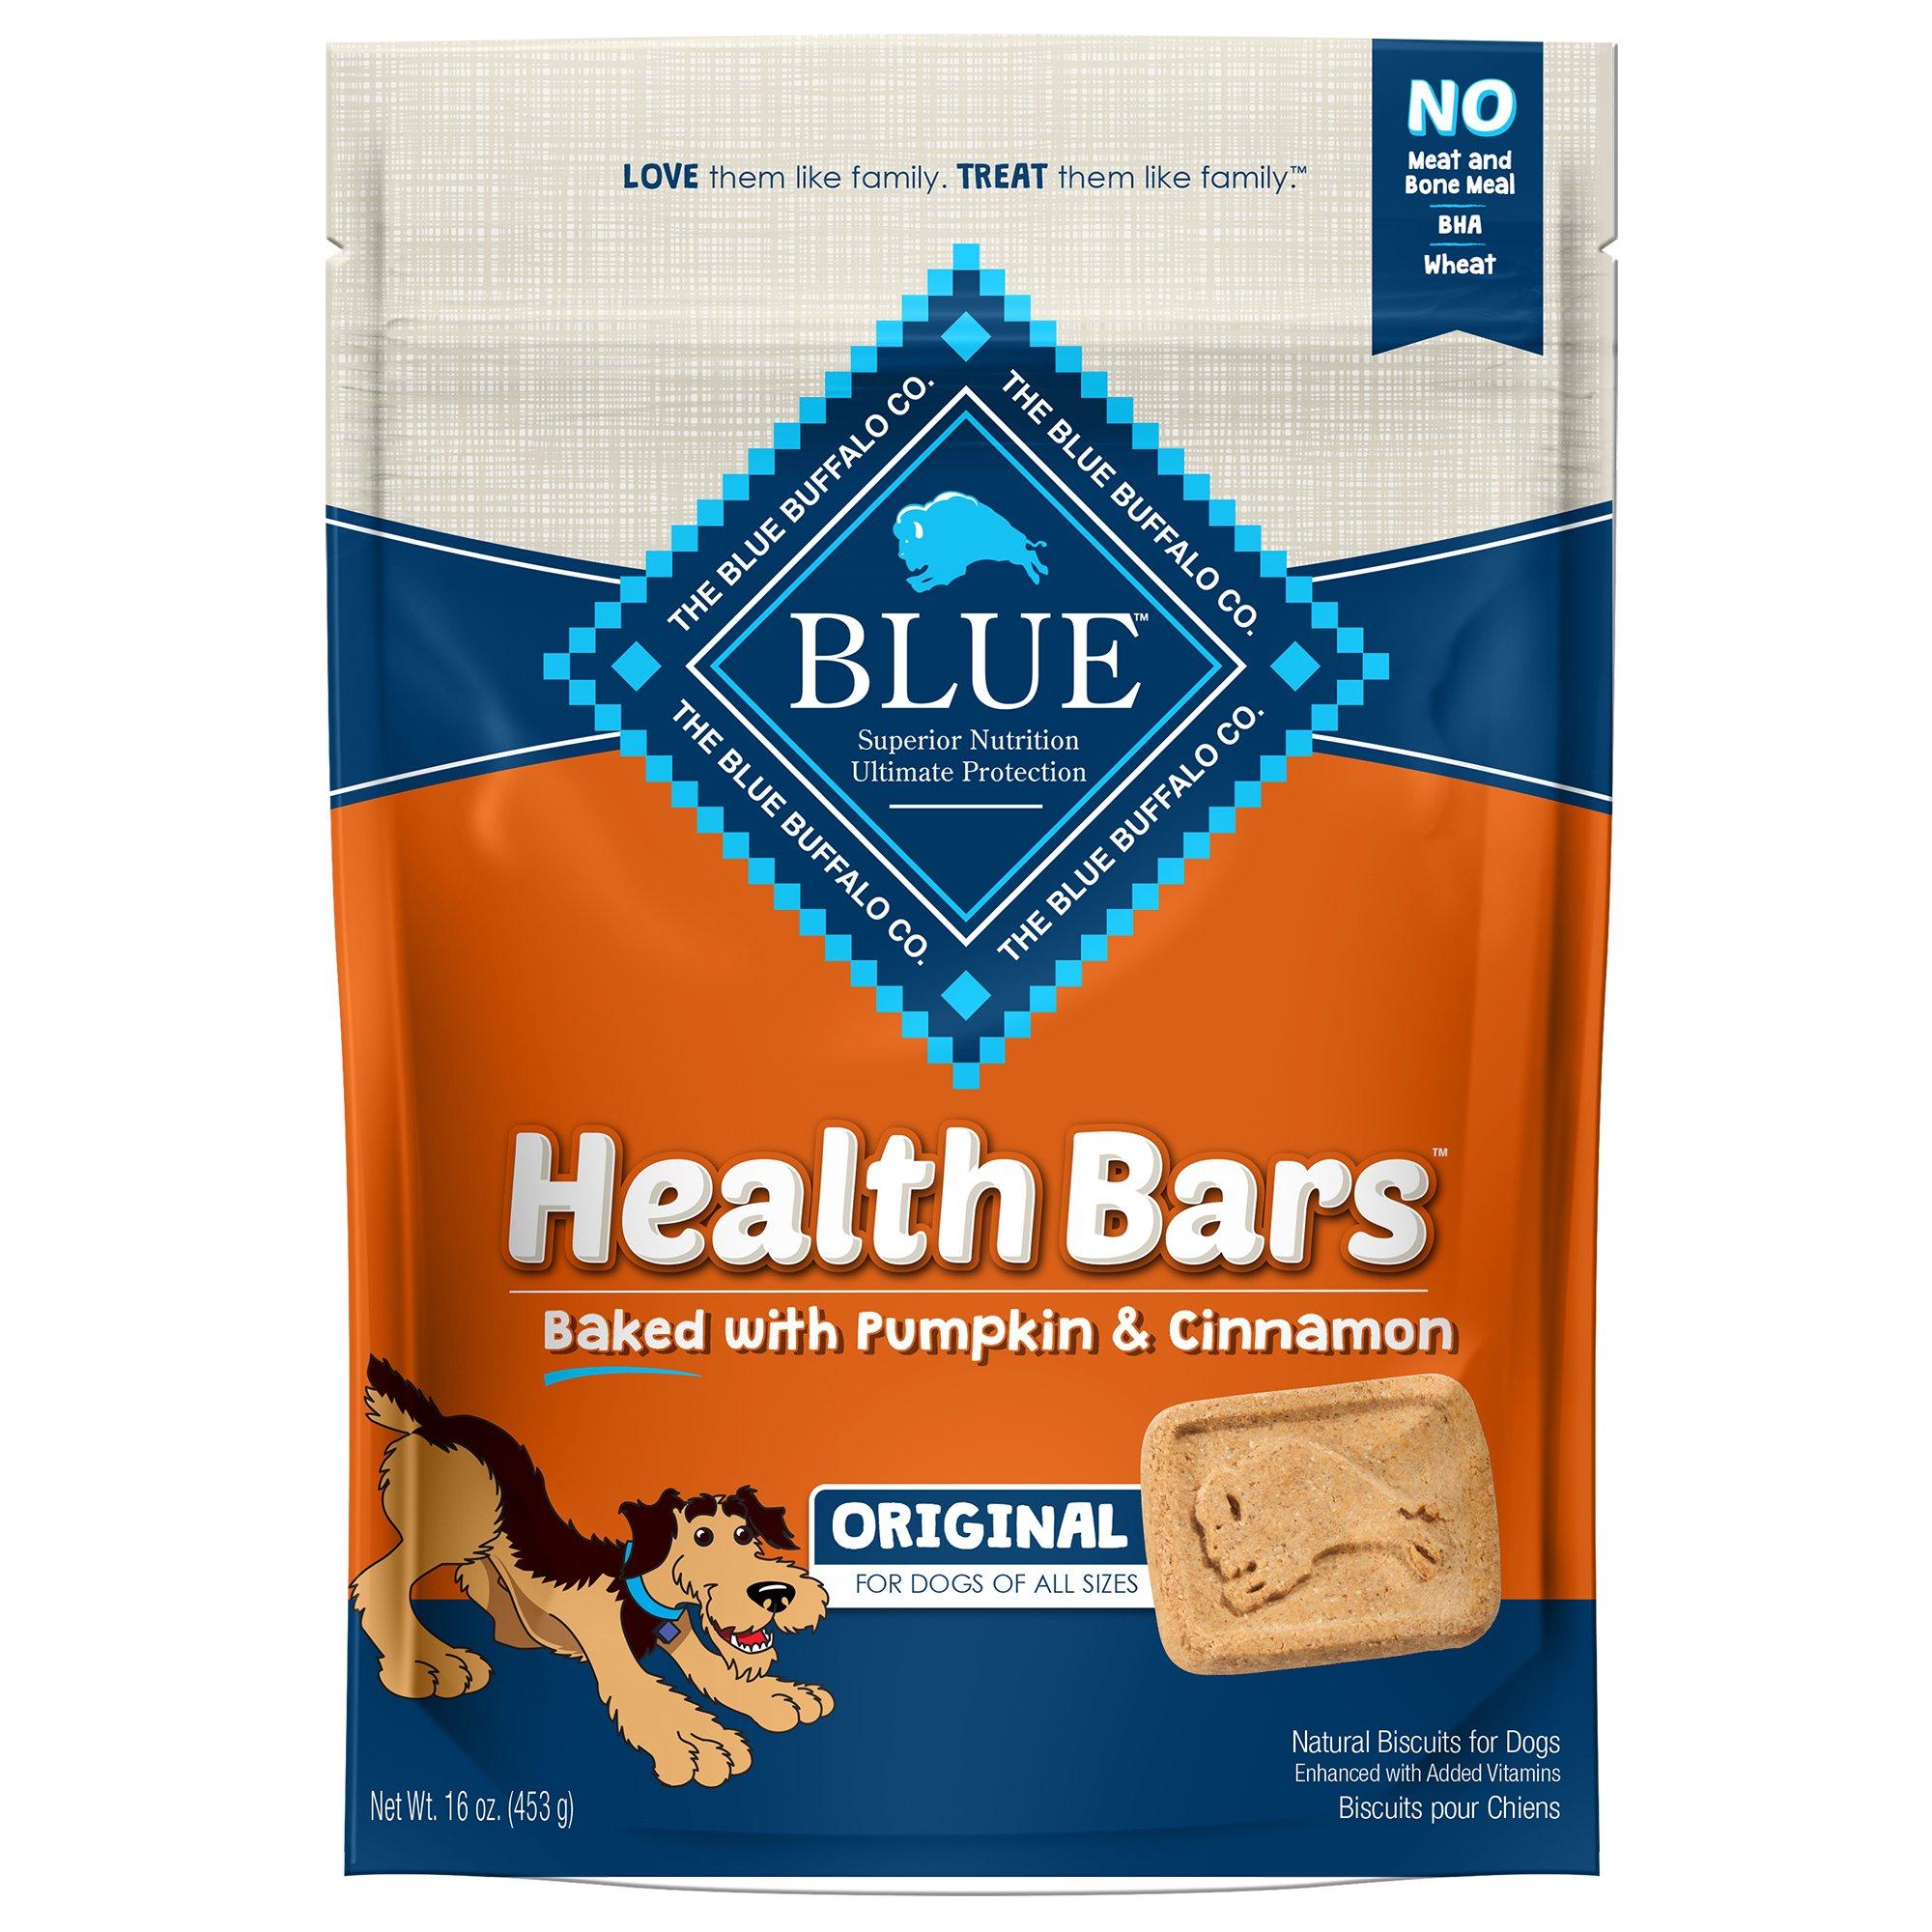 Blue Buffalo Health Bar Pumpkin & Cinnamon Dog Biscuits